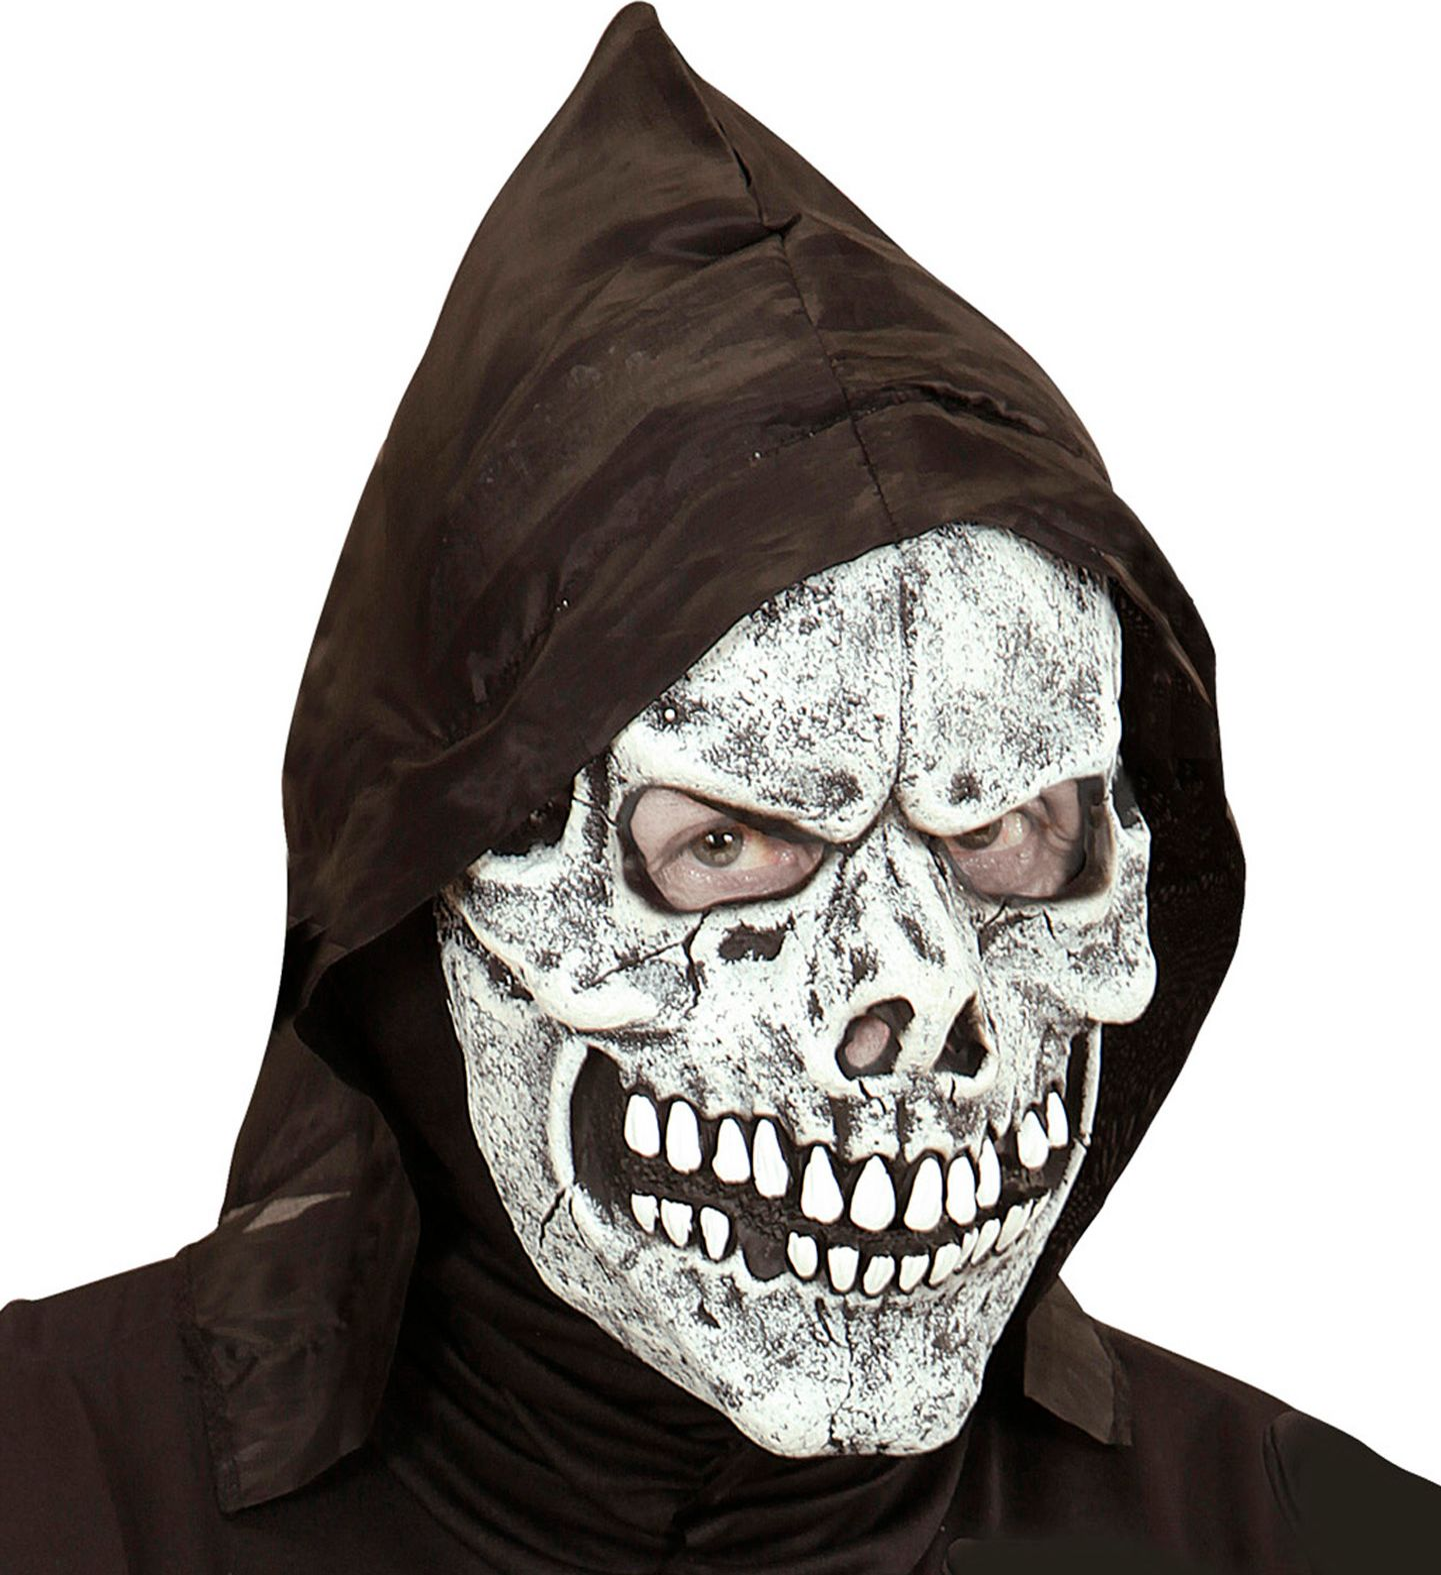 Schedel masker met capuchon